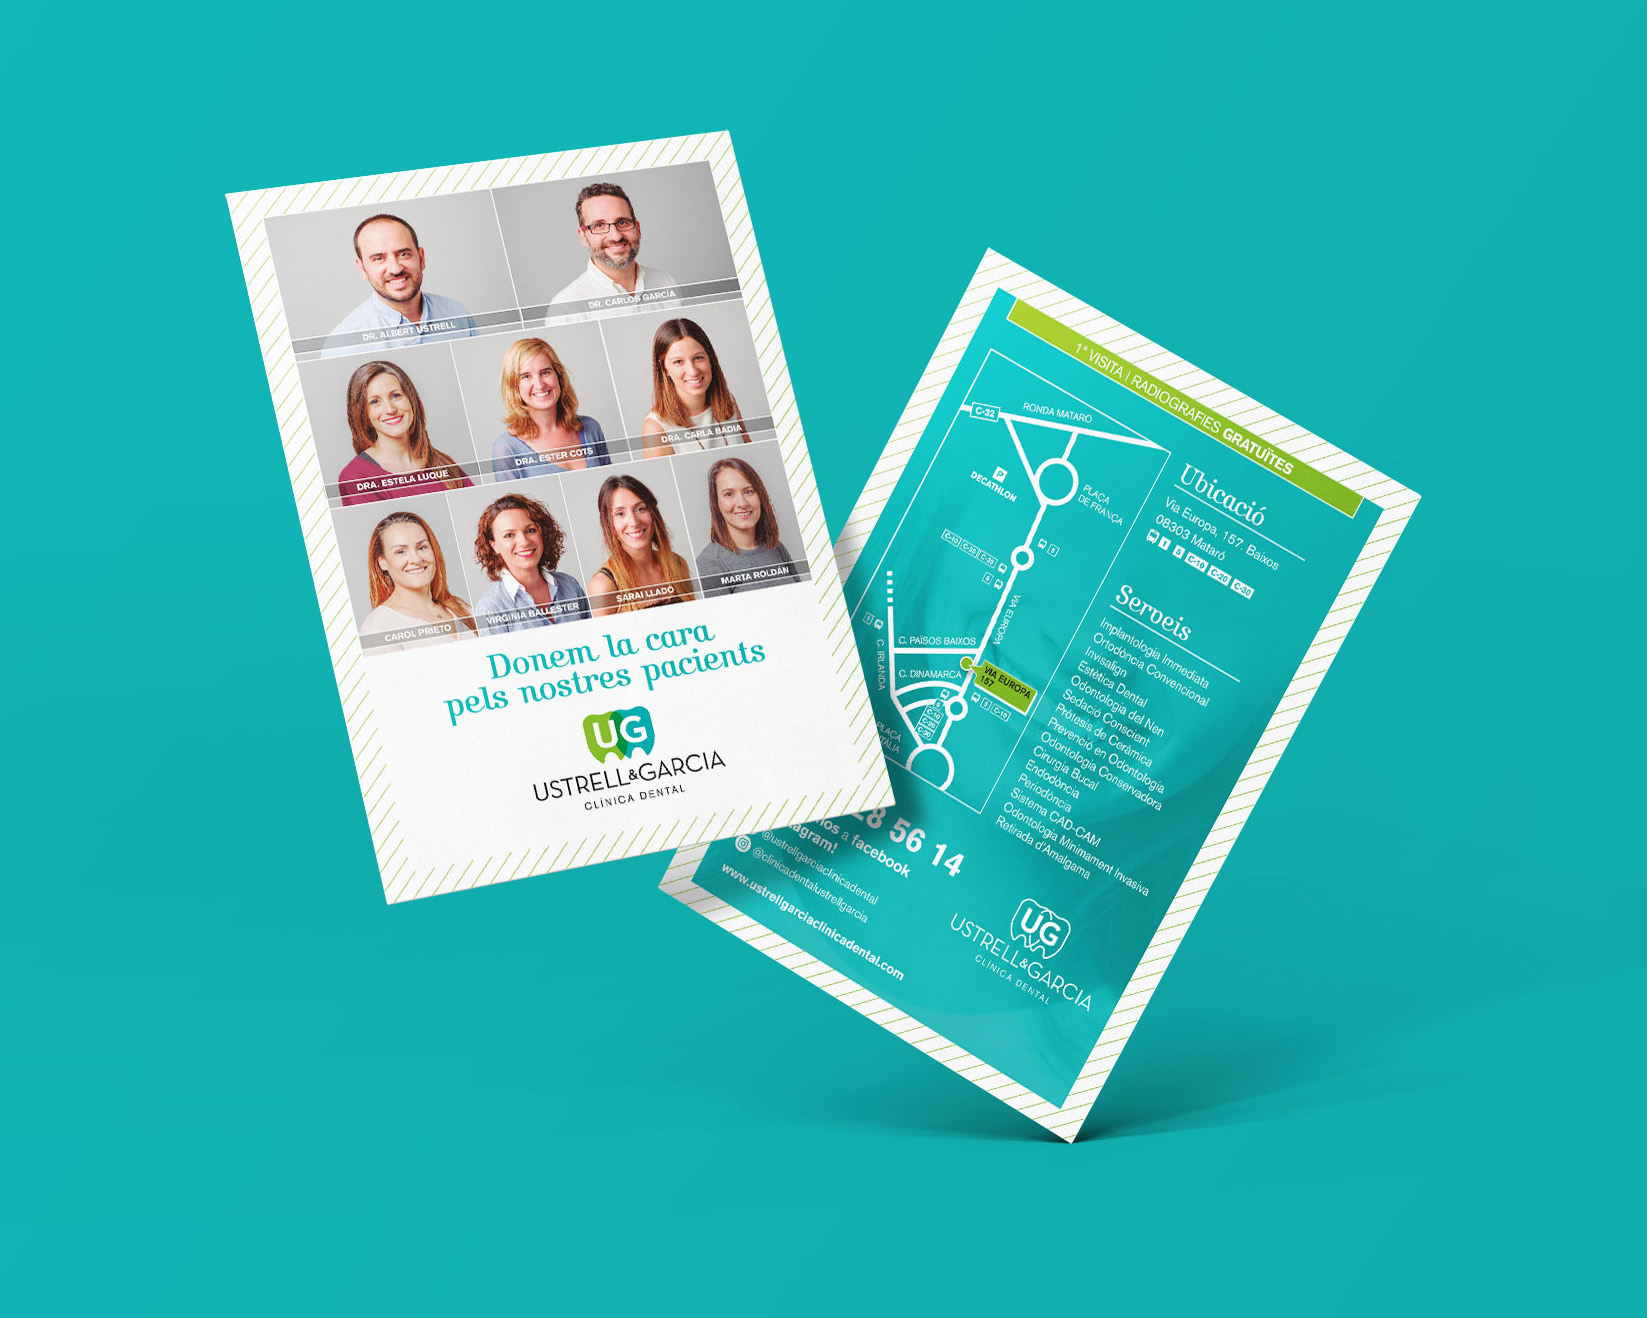 Flyer promoción Clínica Dental Ustrell & García